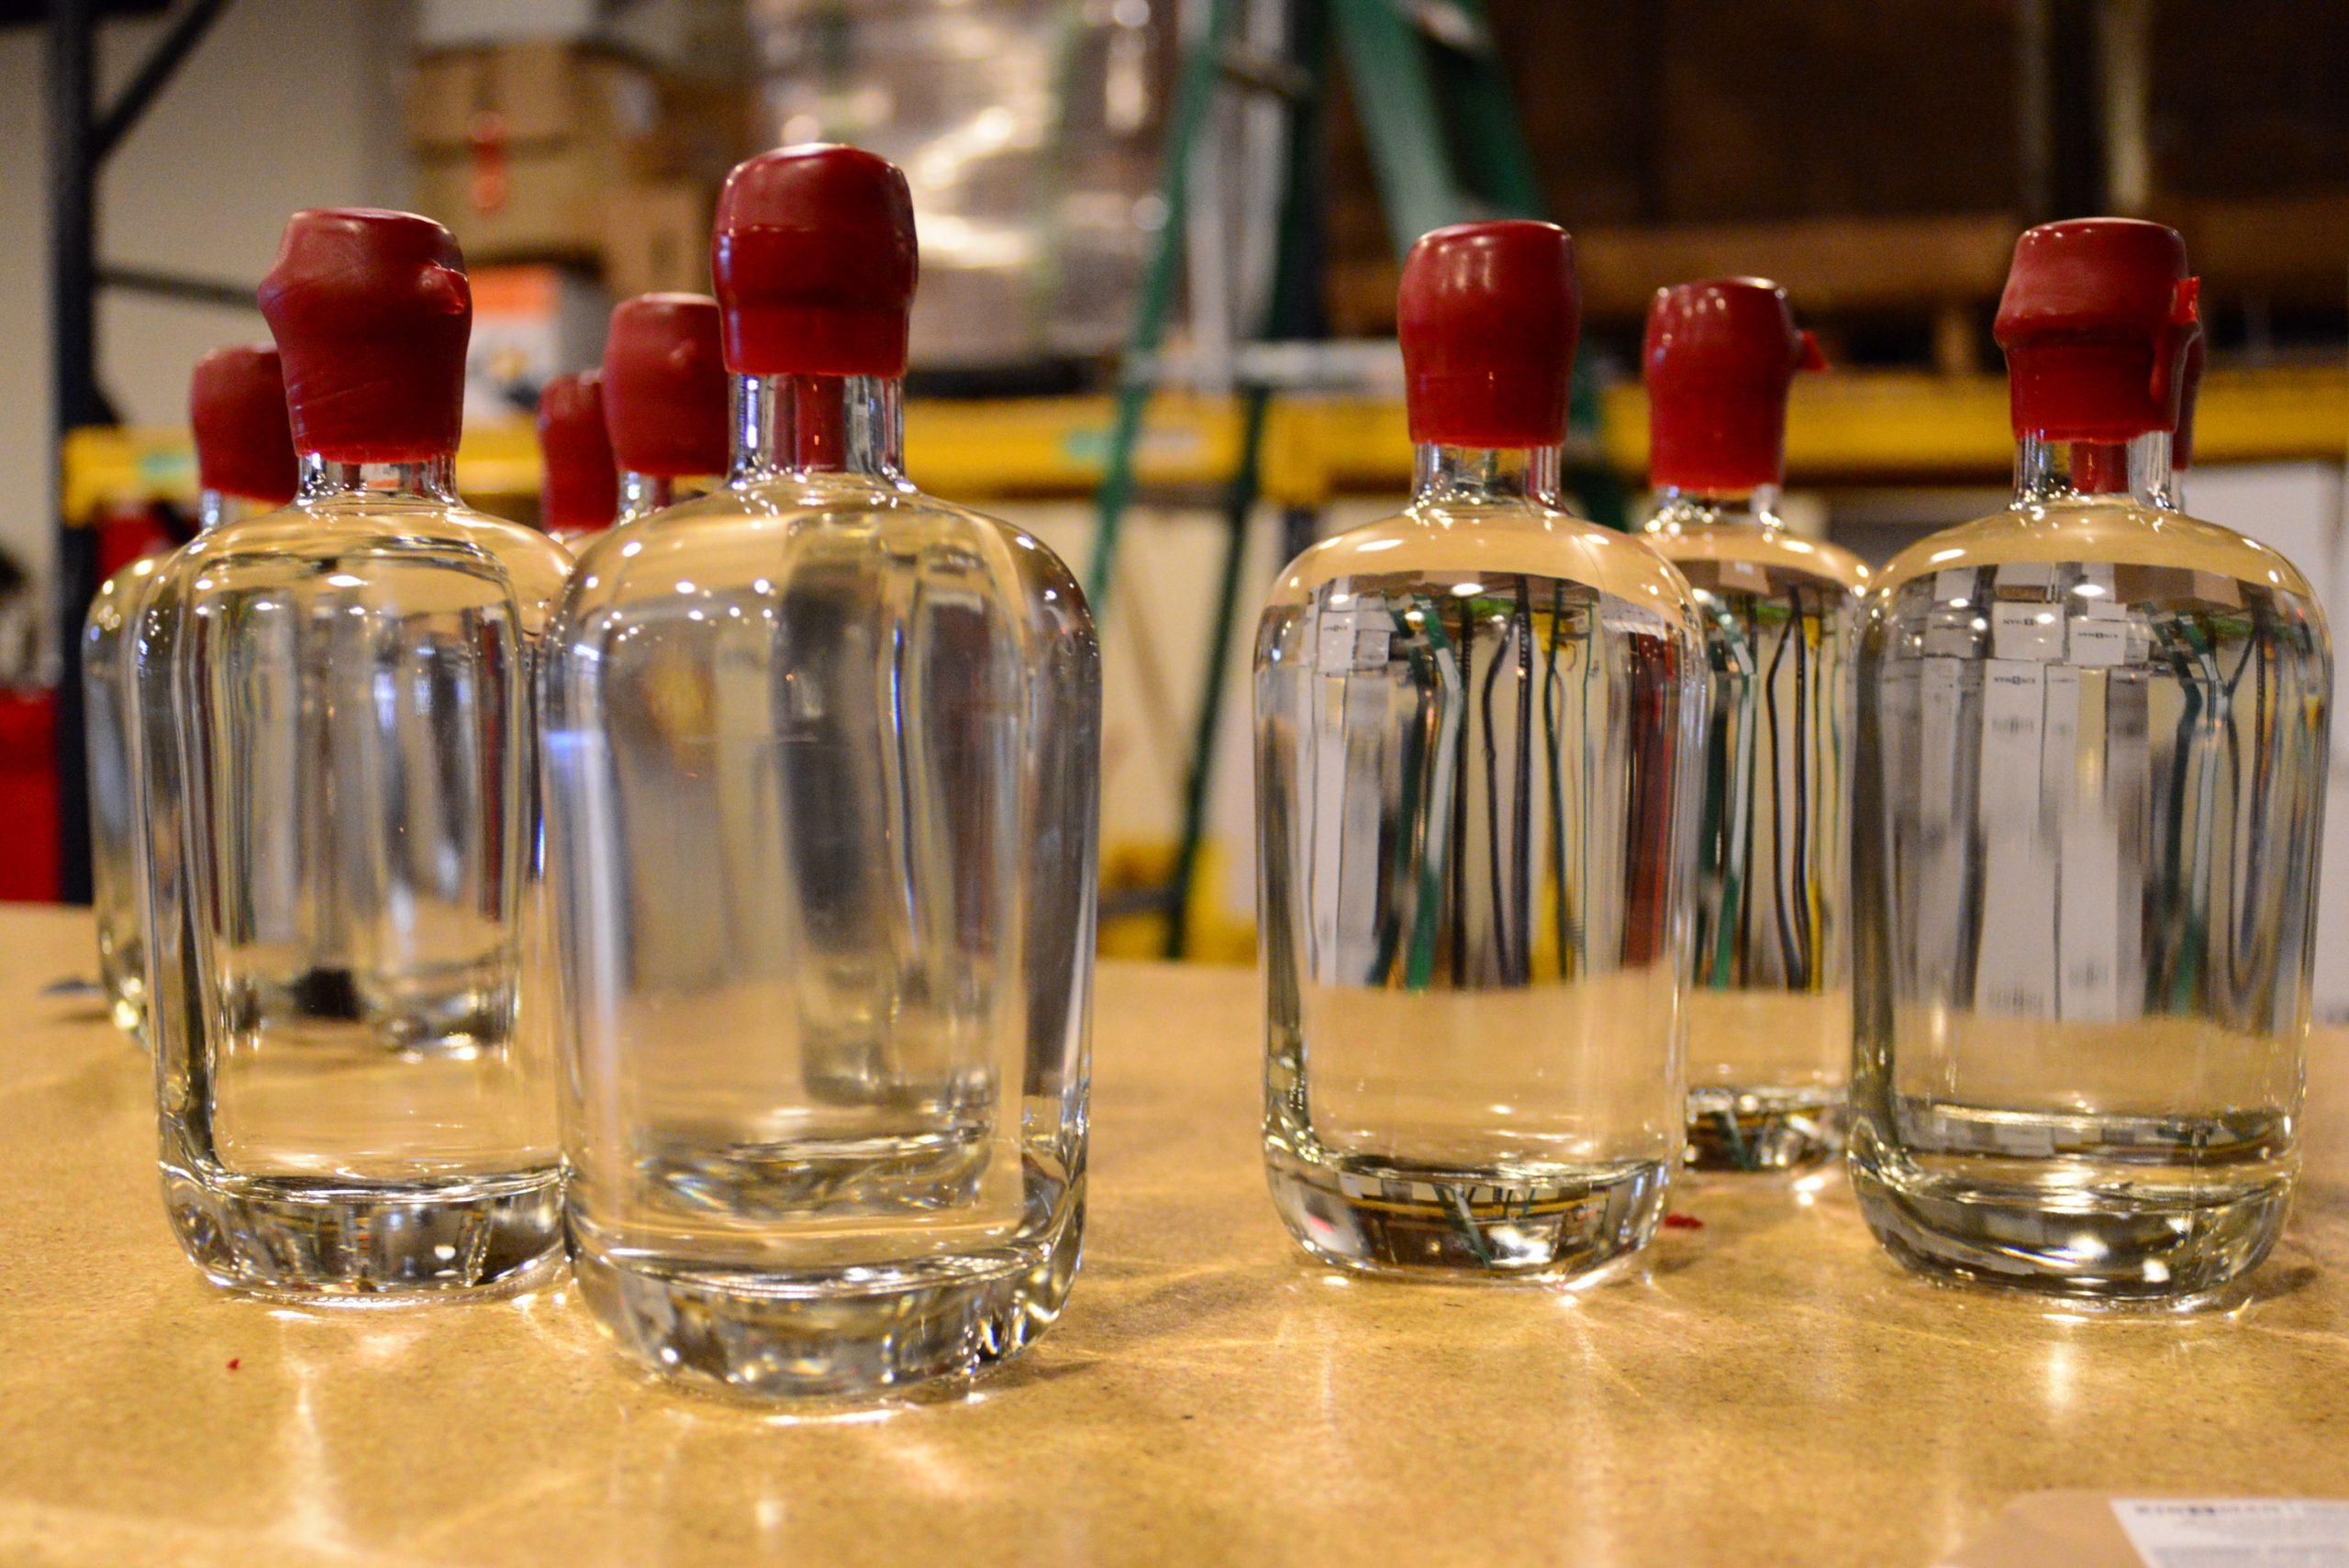 Bottles of Kinsman Rakia await labeling. Photo by Page Graham.